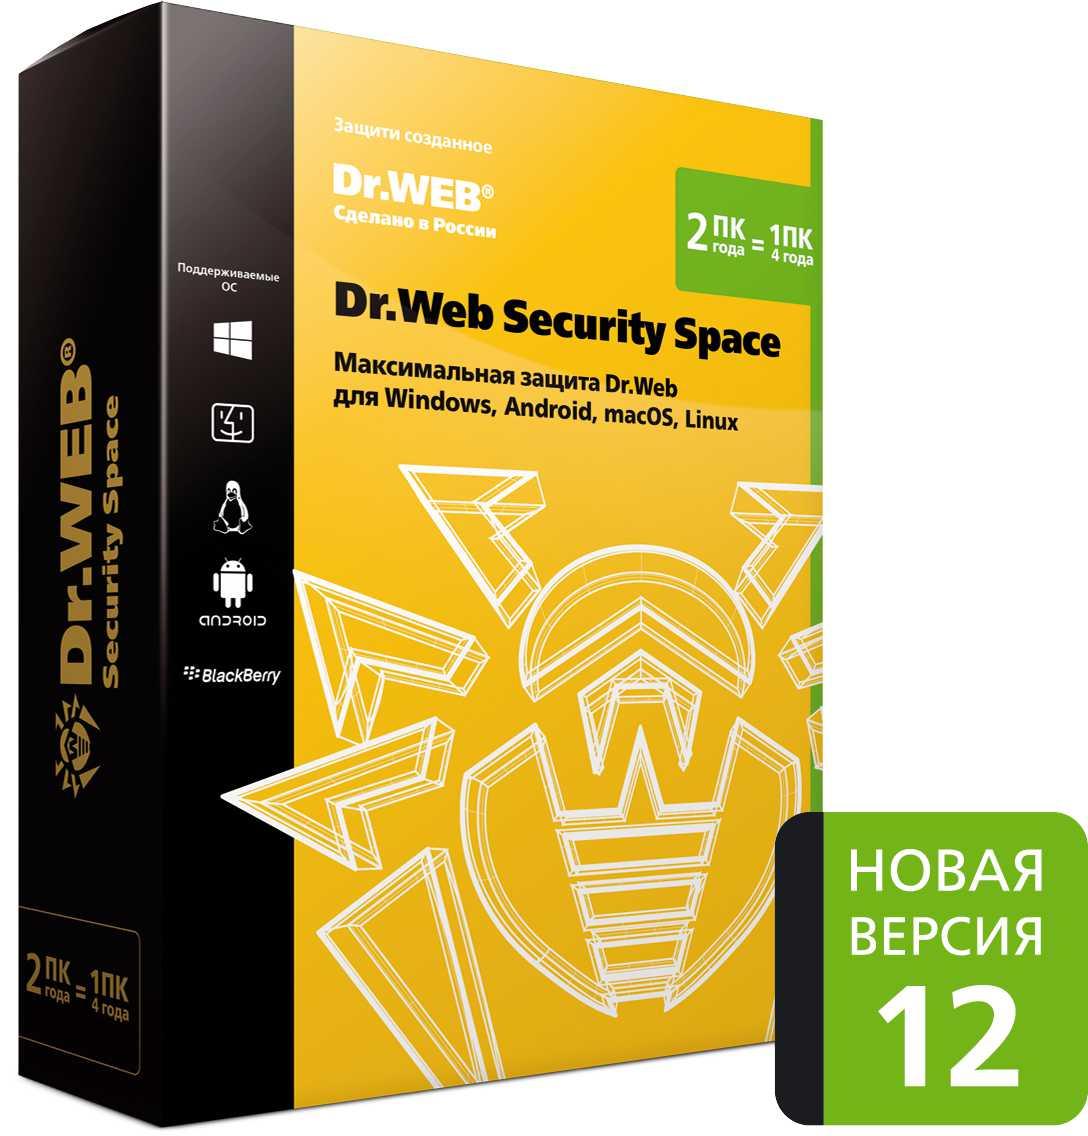 Dr.Web Security Space (2 ПК + 2 моб. устр./2года или 1 ПК + 1 моб. устр./ 4 года)